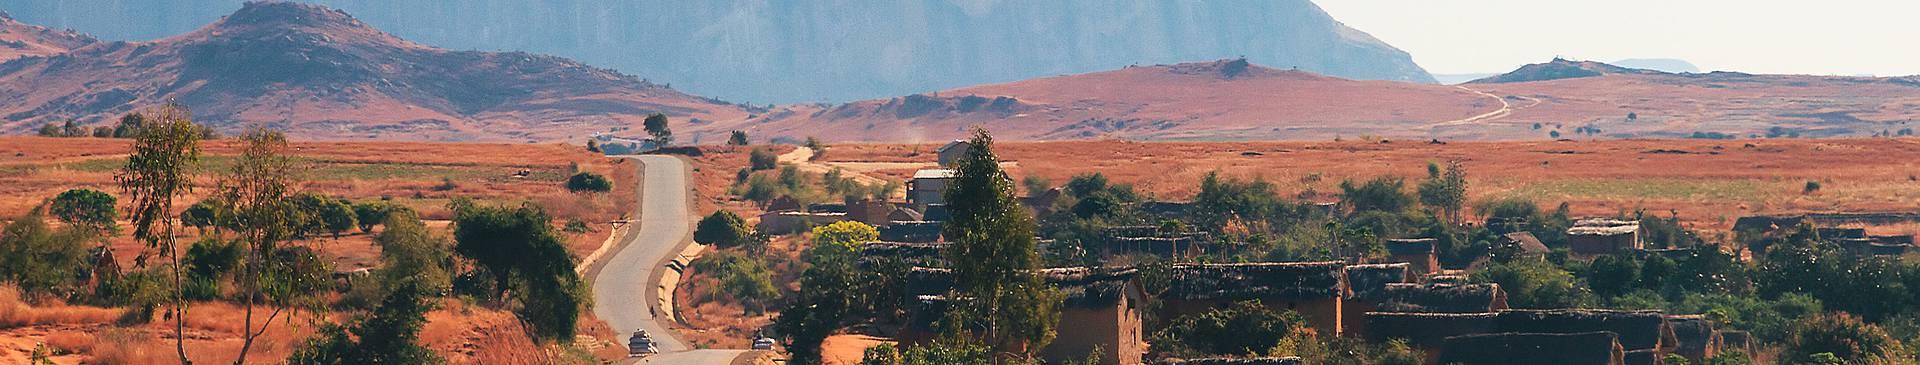 Rutas en coche por Madagascar